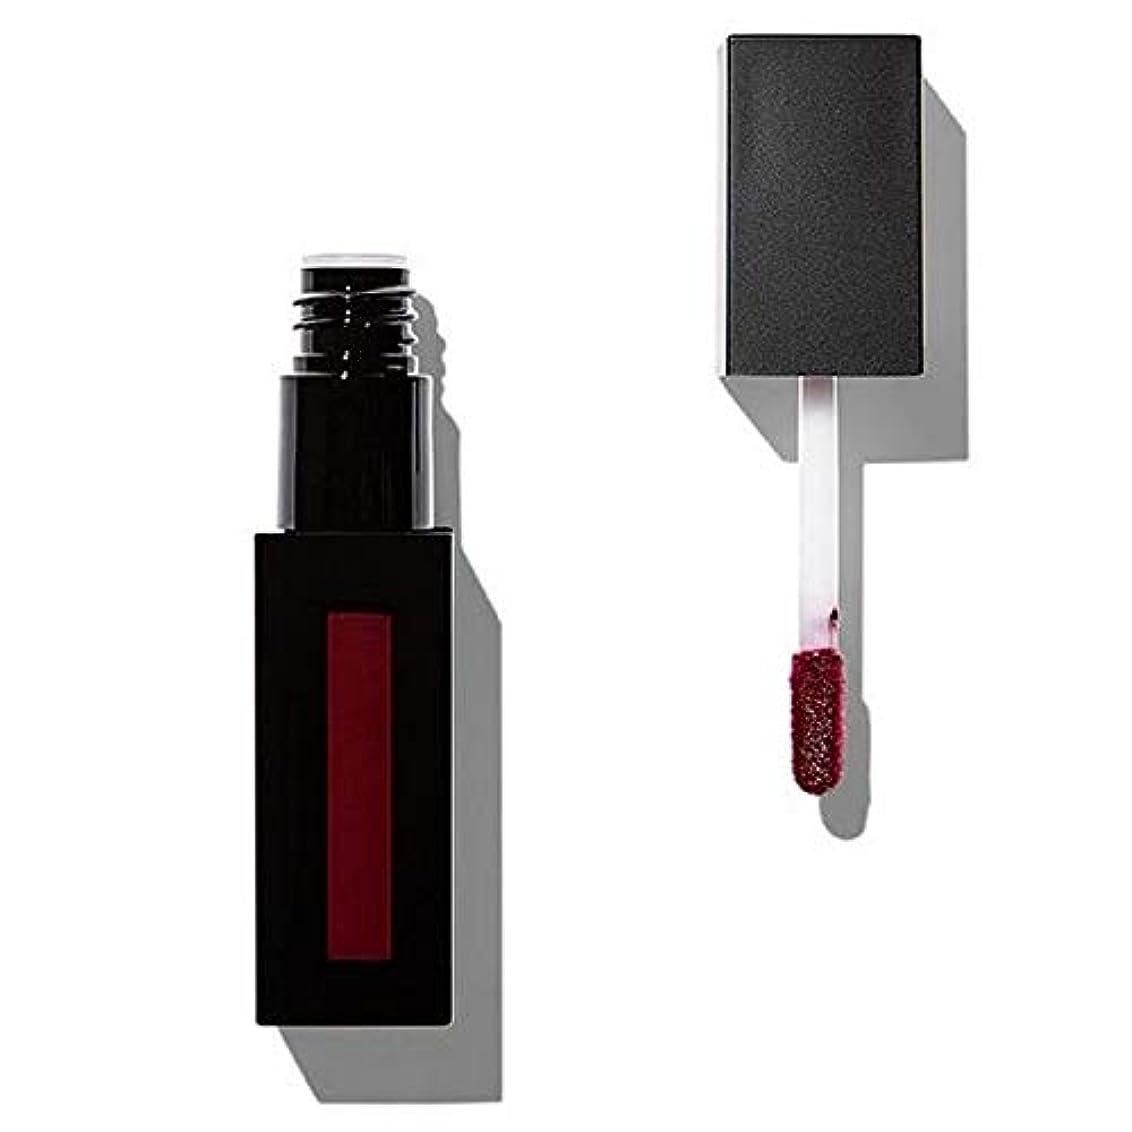 [Revolution ] 革命プロ最高のマットリップ顔料第六感 - Revolution Pro Supreme Matte Lip Pigment Sixth Sense [並行輸入品]